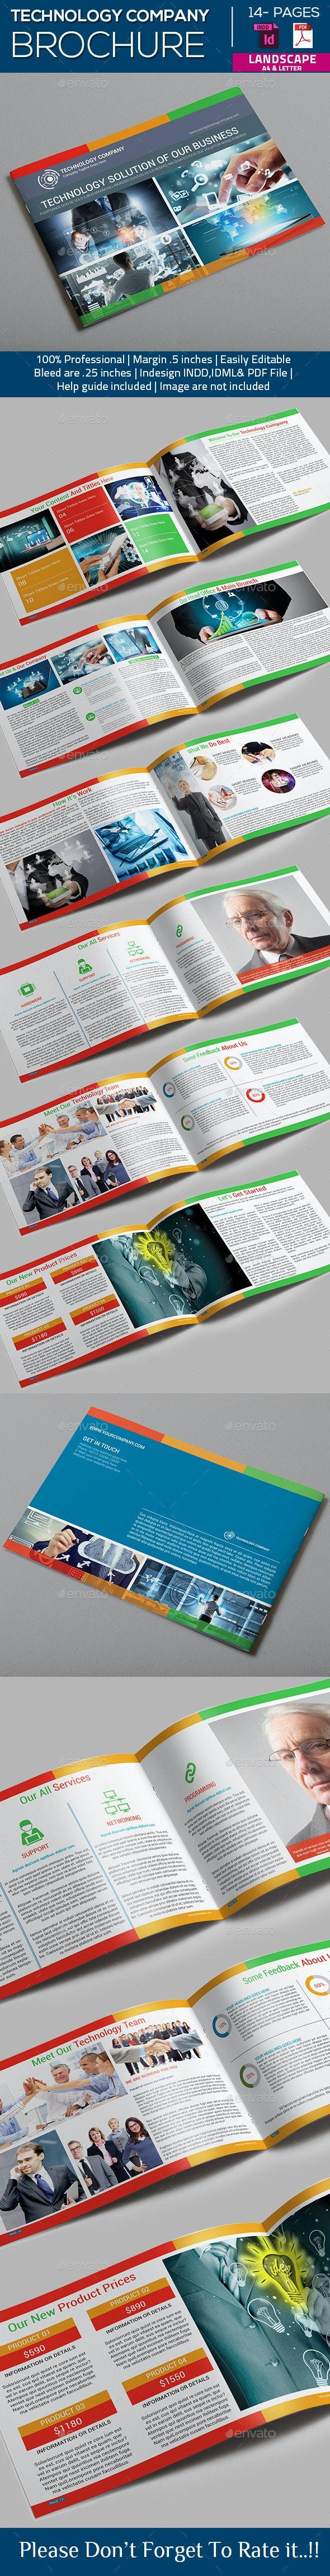 Technology Company Brochure - Catalogs Brochures